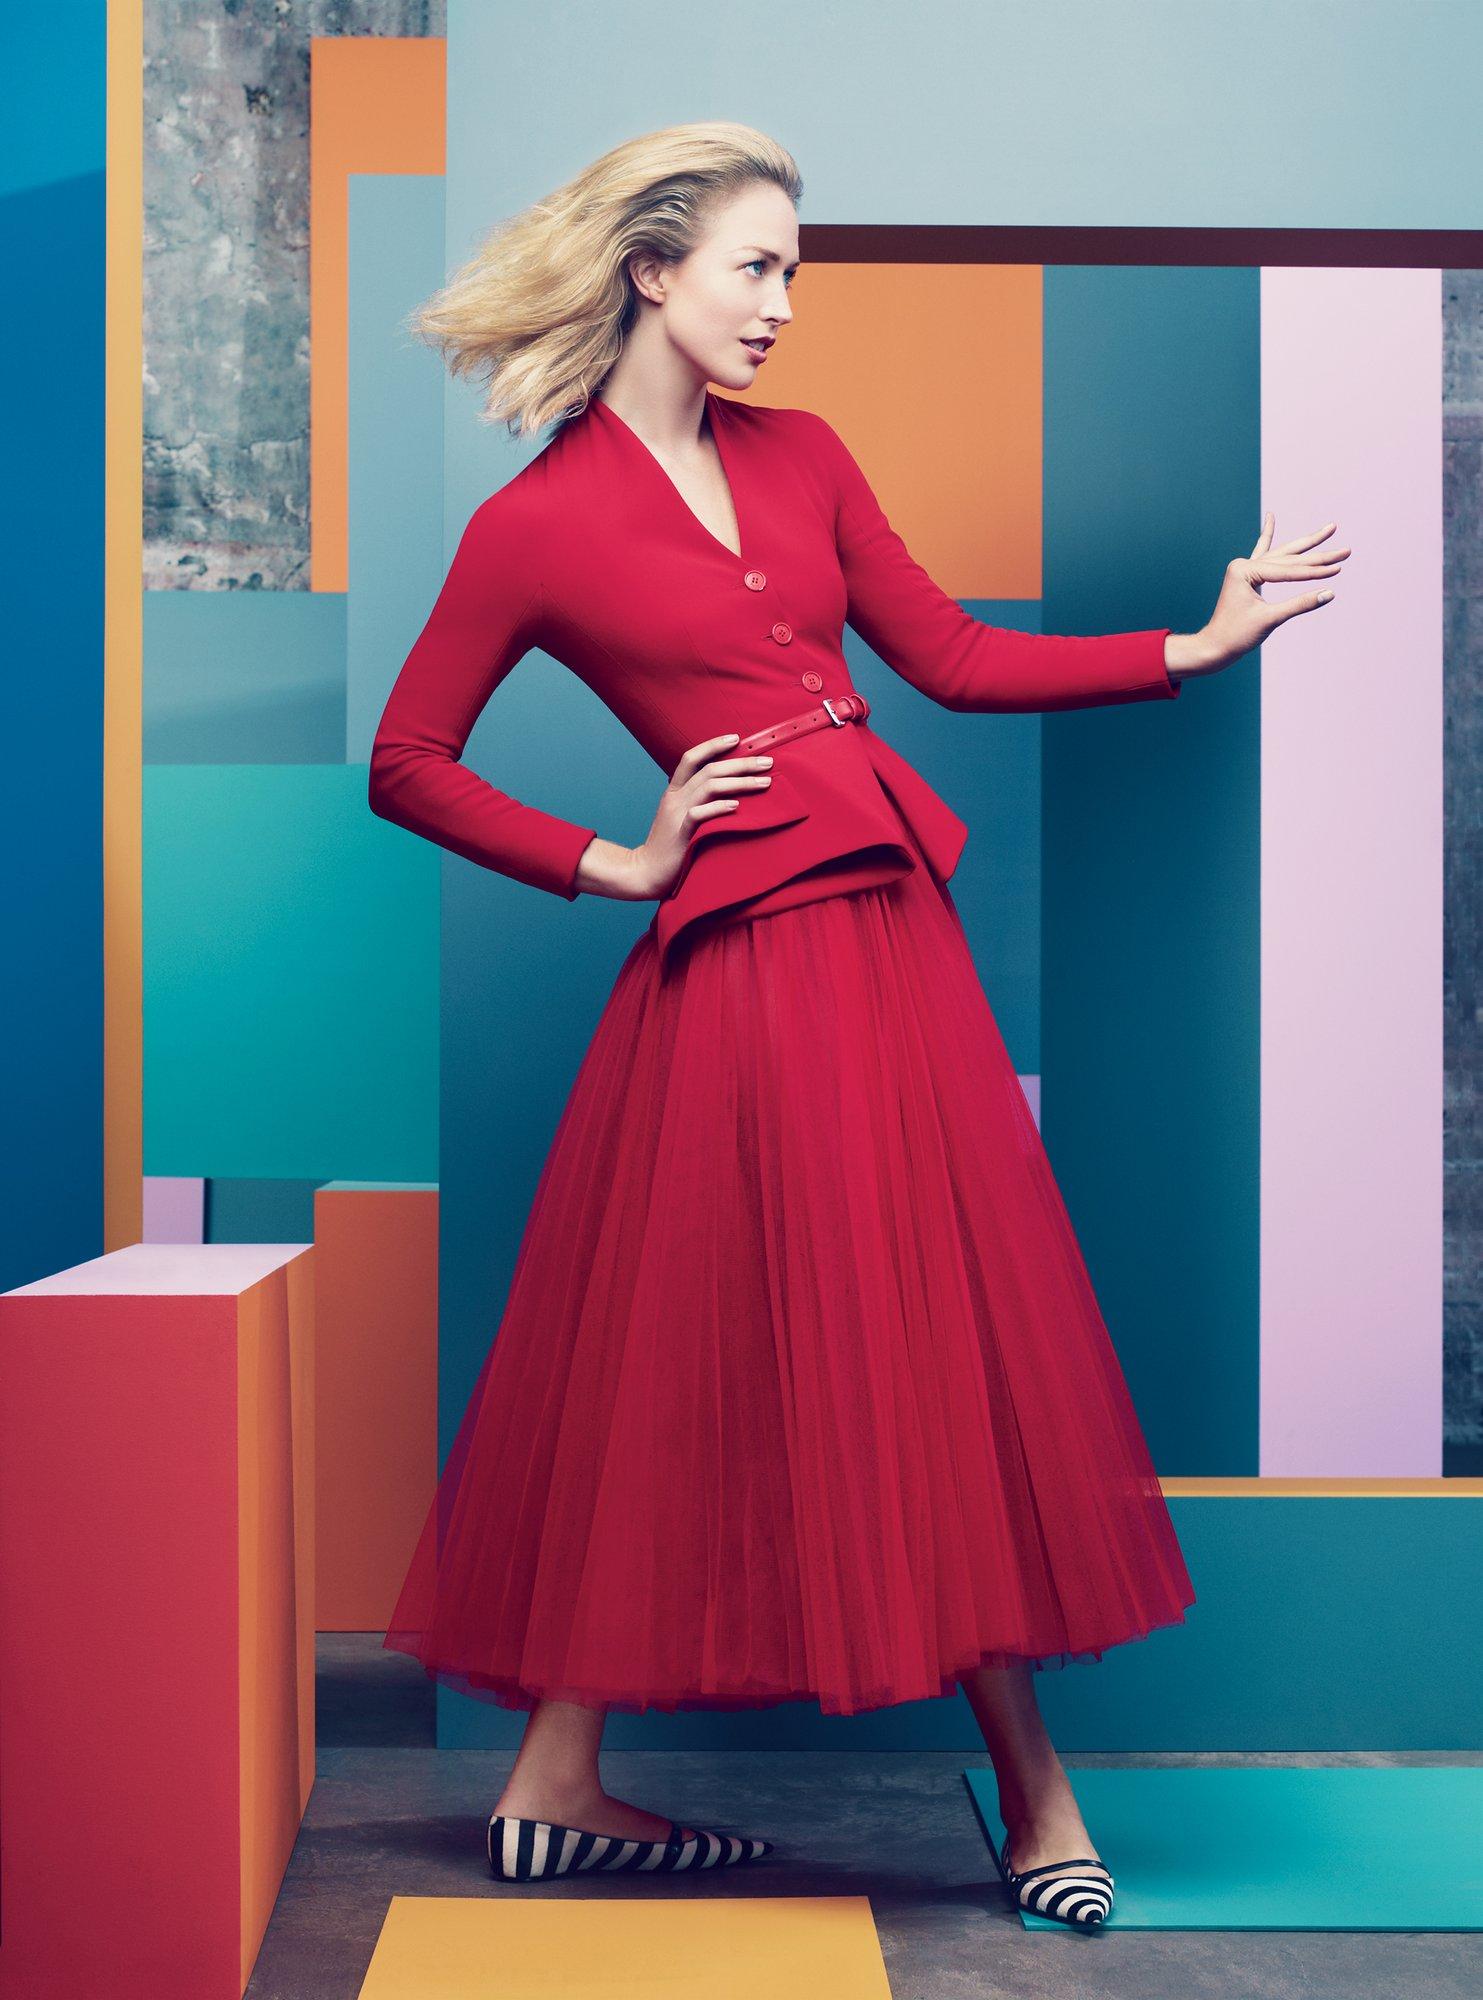 Raquel Zimmermann in Christian Dior